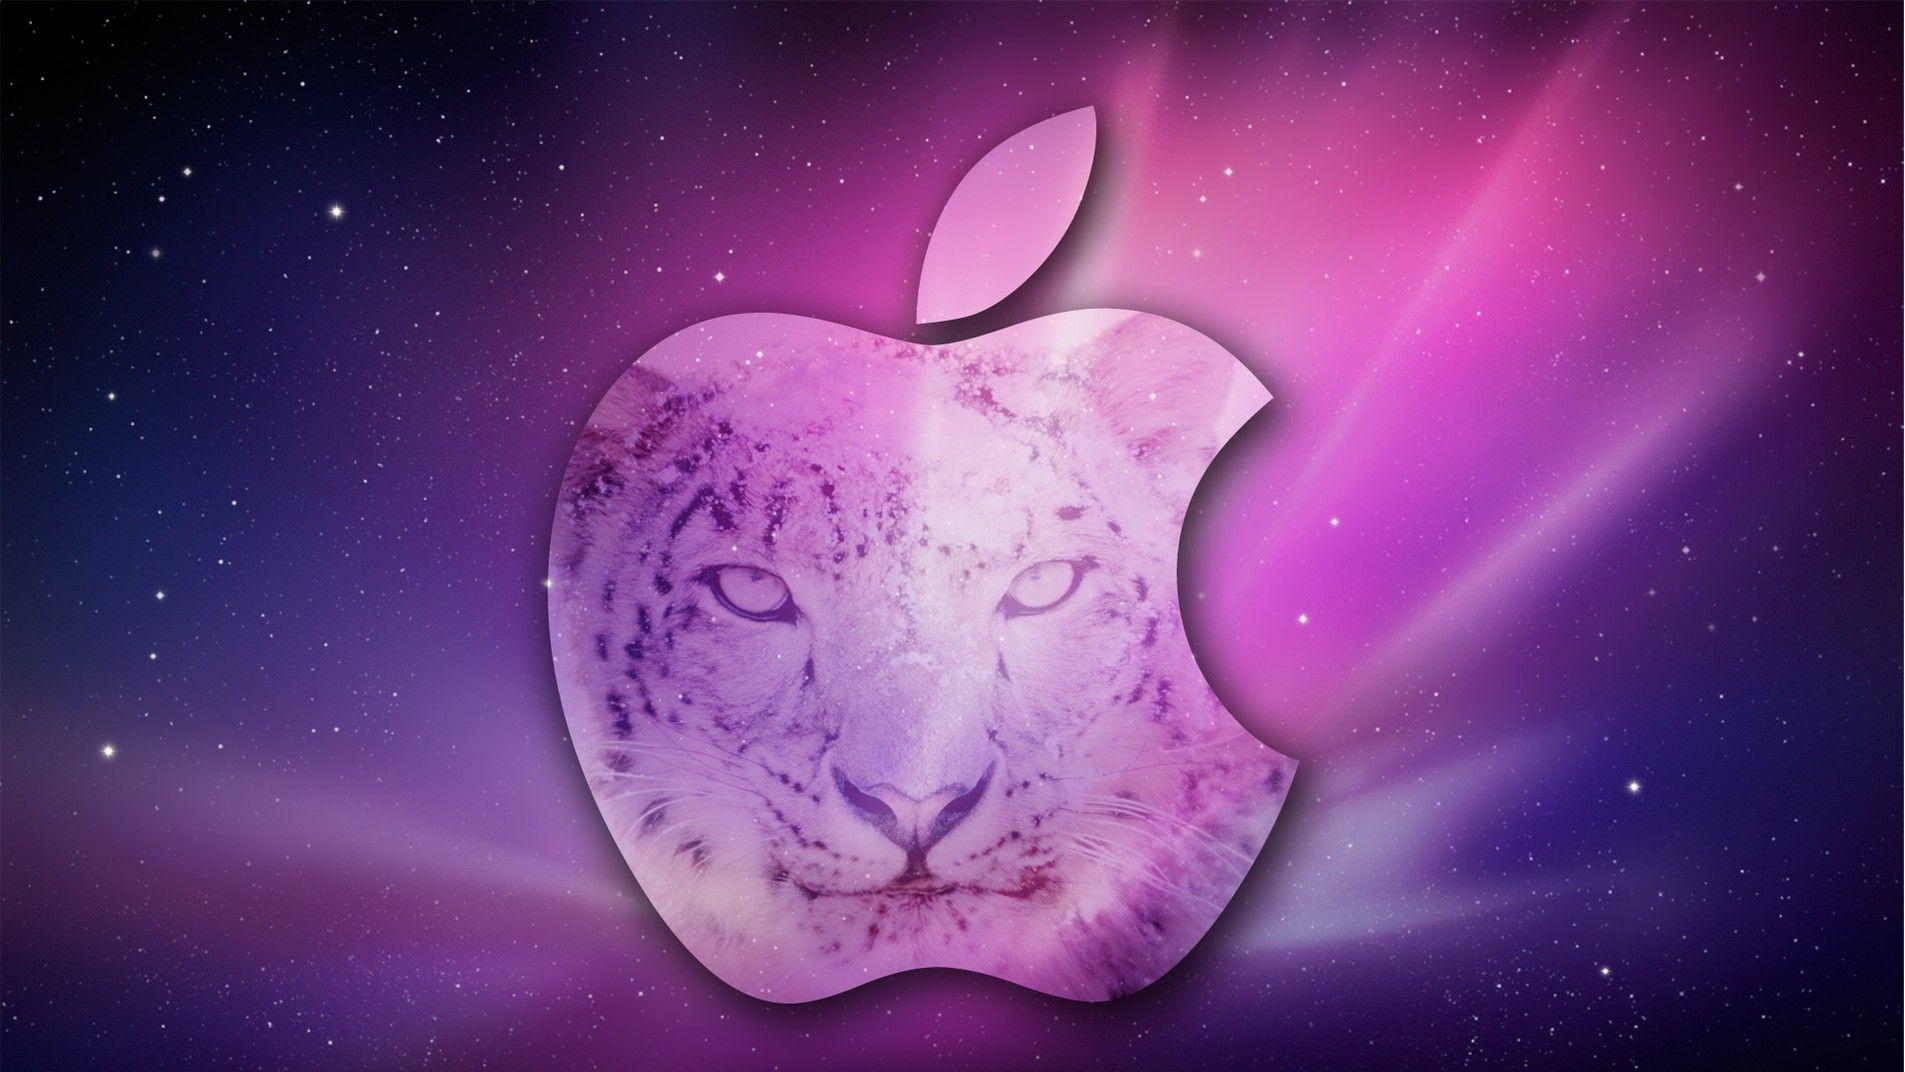 apple-wallpaper-hd-desktop-156 | mac wall paper | pinterest | apple